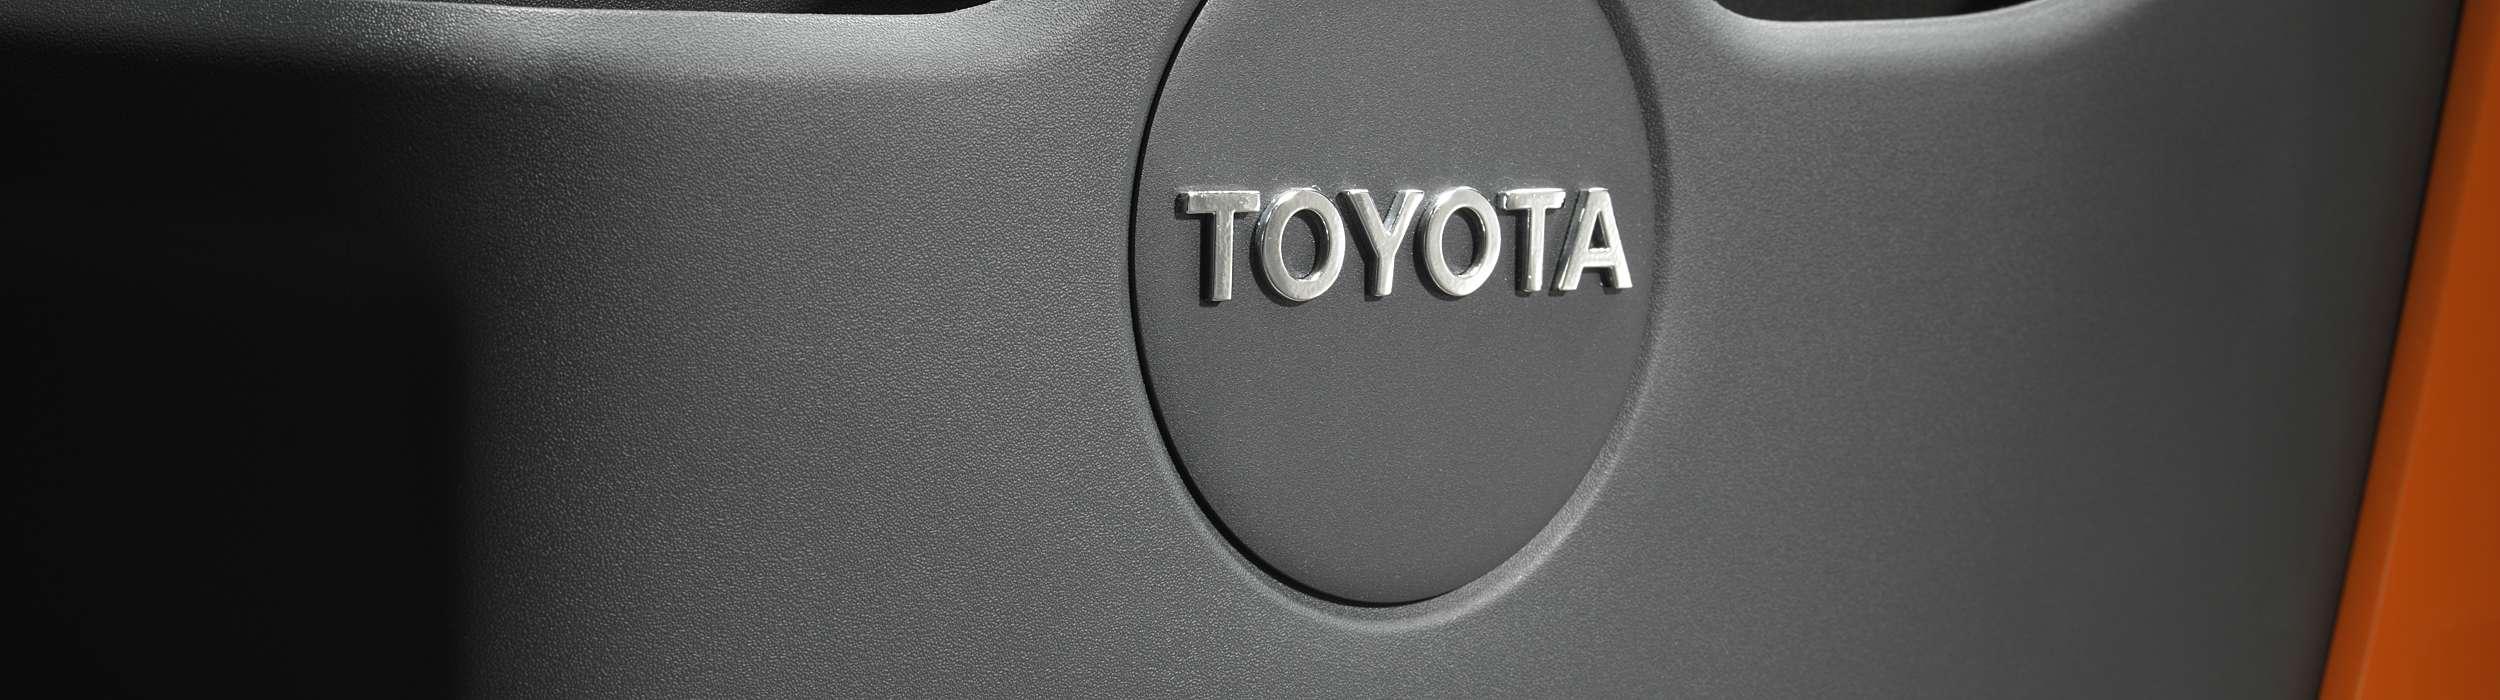 Close up on Toyota logo